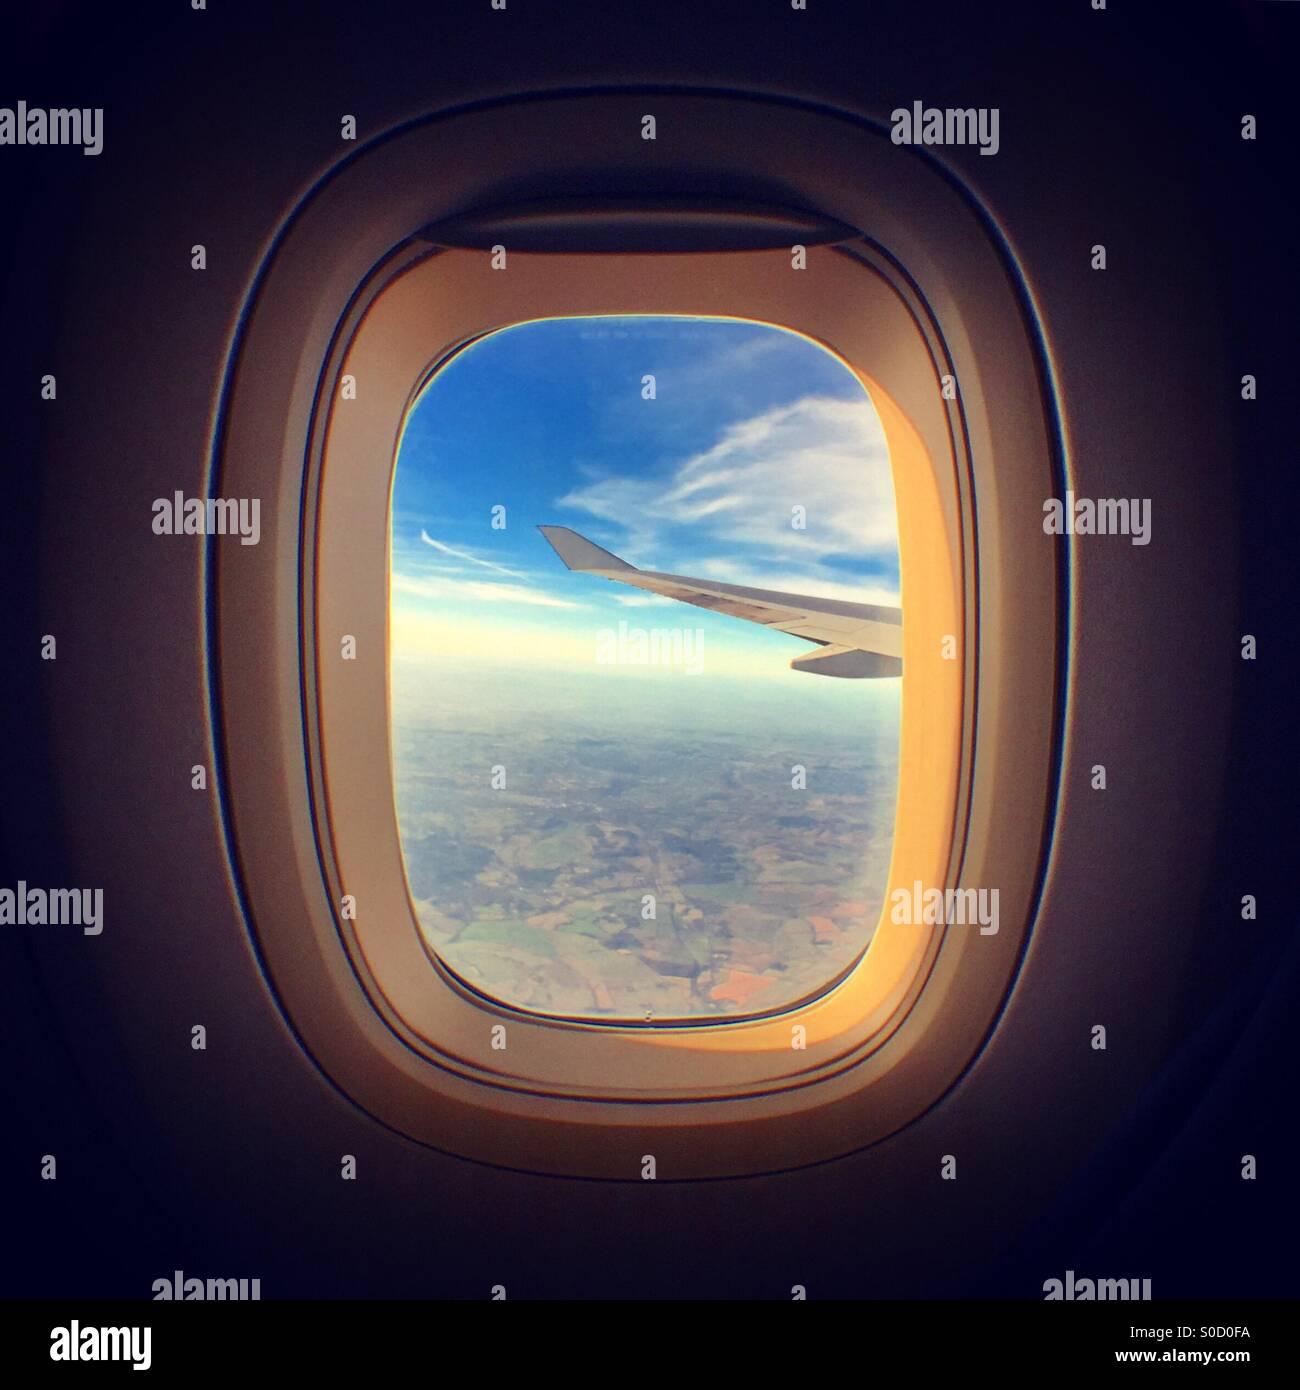 Stunning view through a plane window - Stock Image